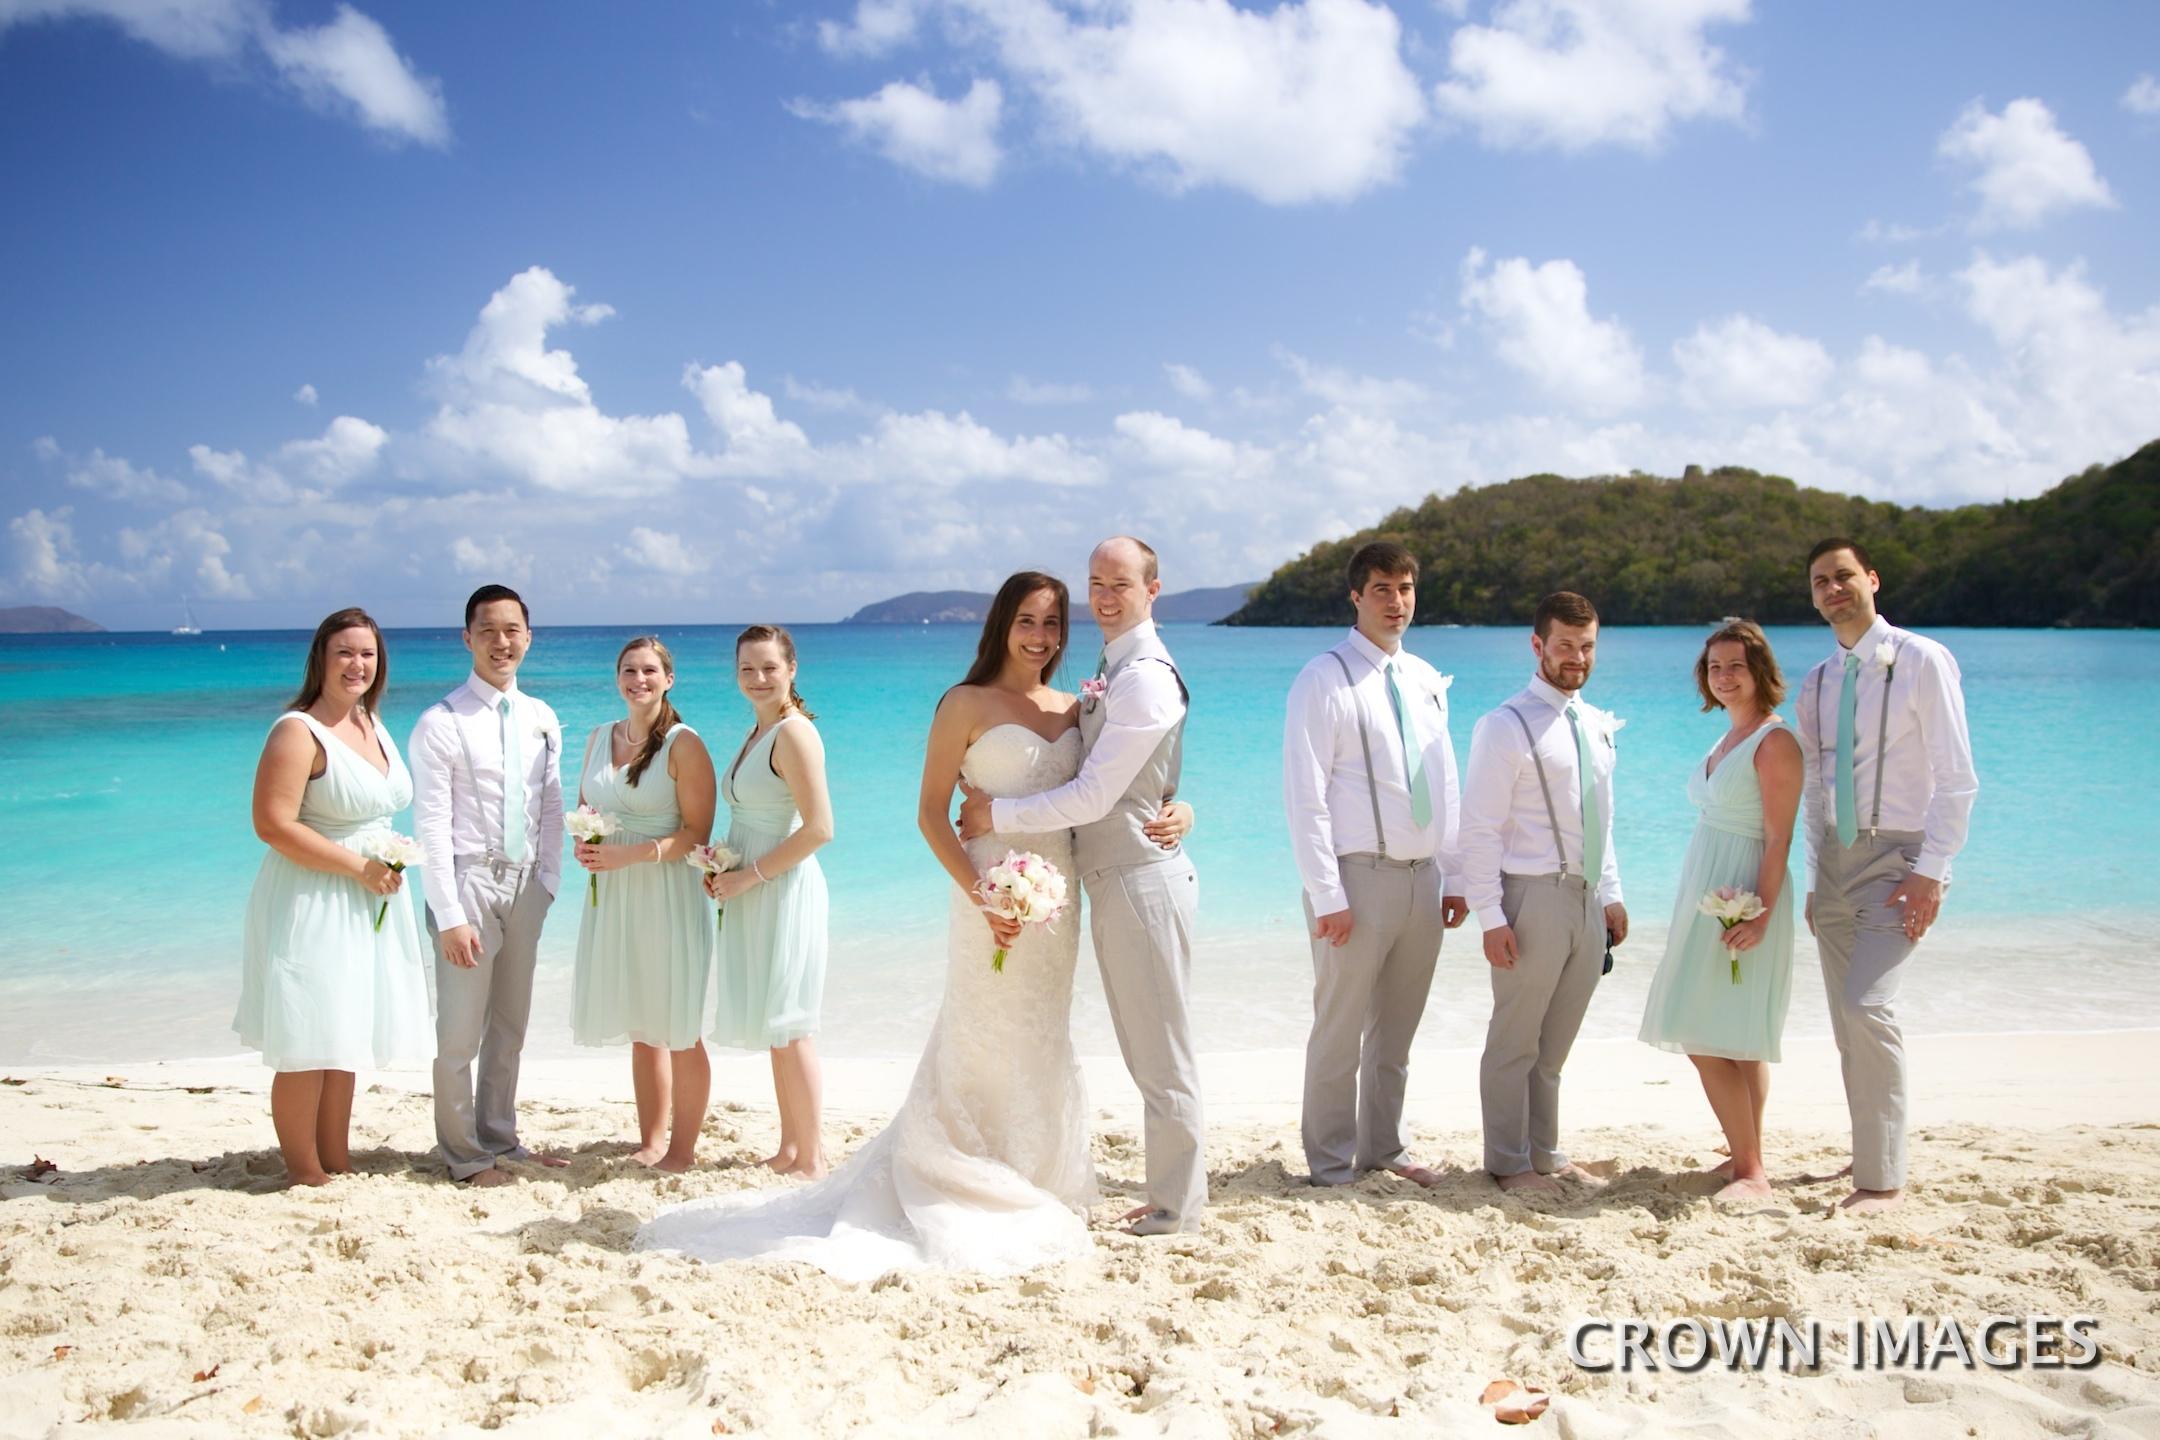 st john wedding photos crown images